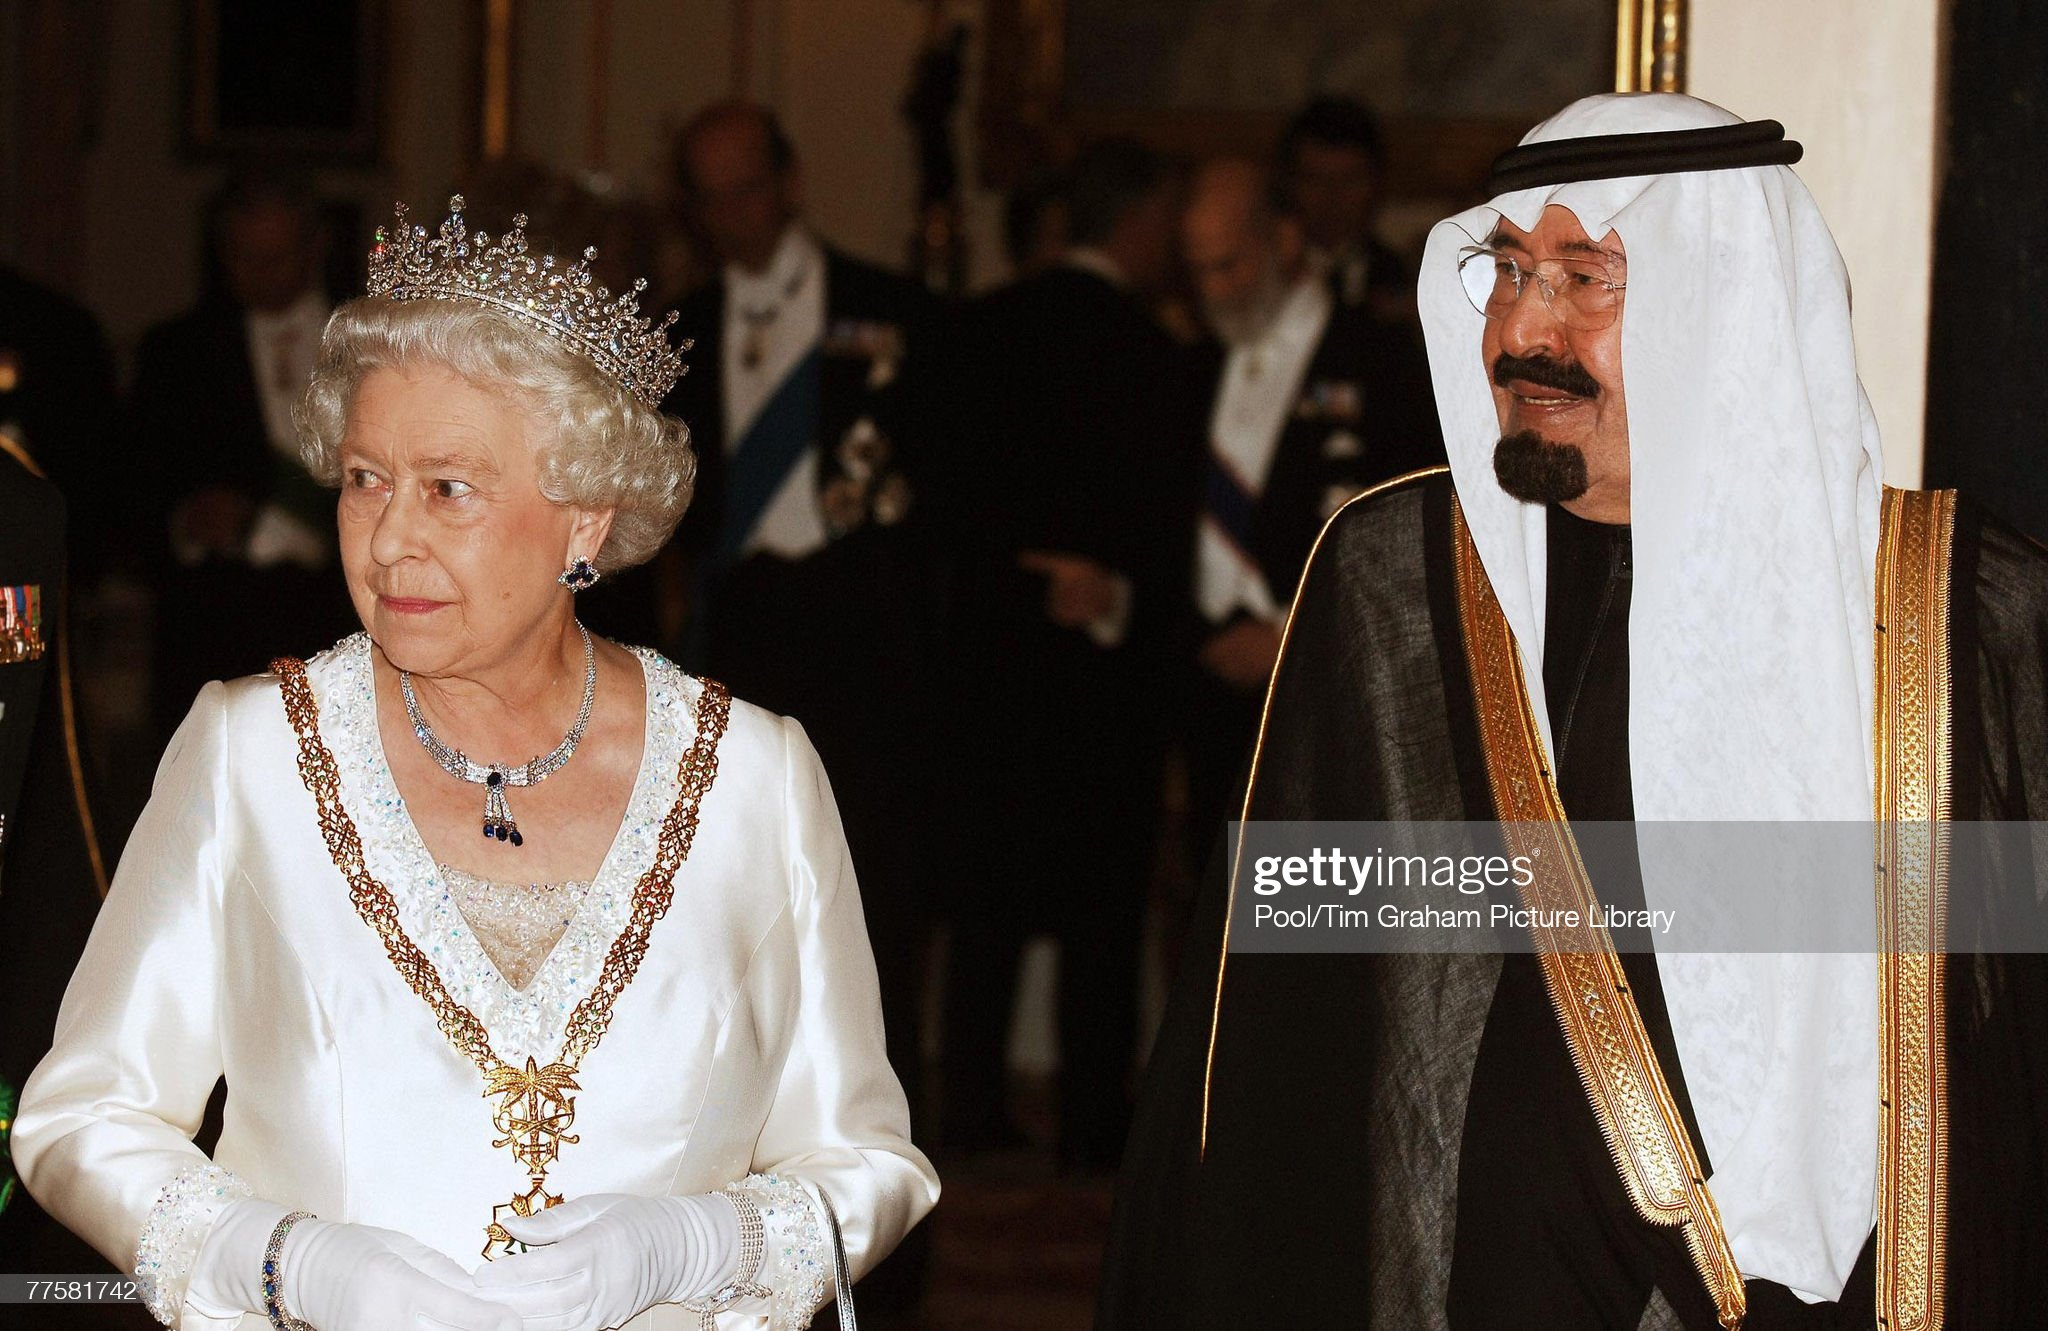 State Banquet For King Abdullah of Saudi Arabia : News Photo